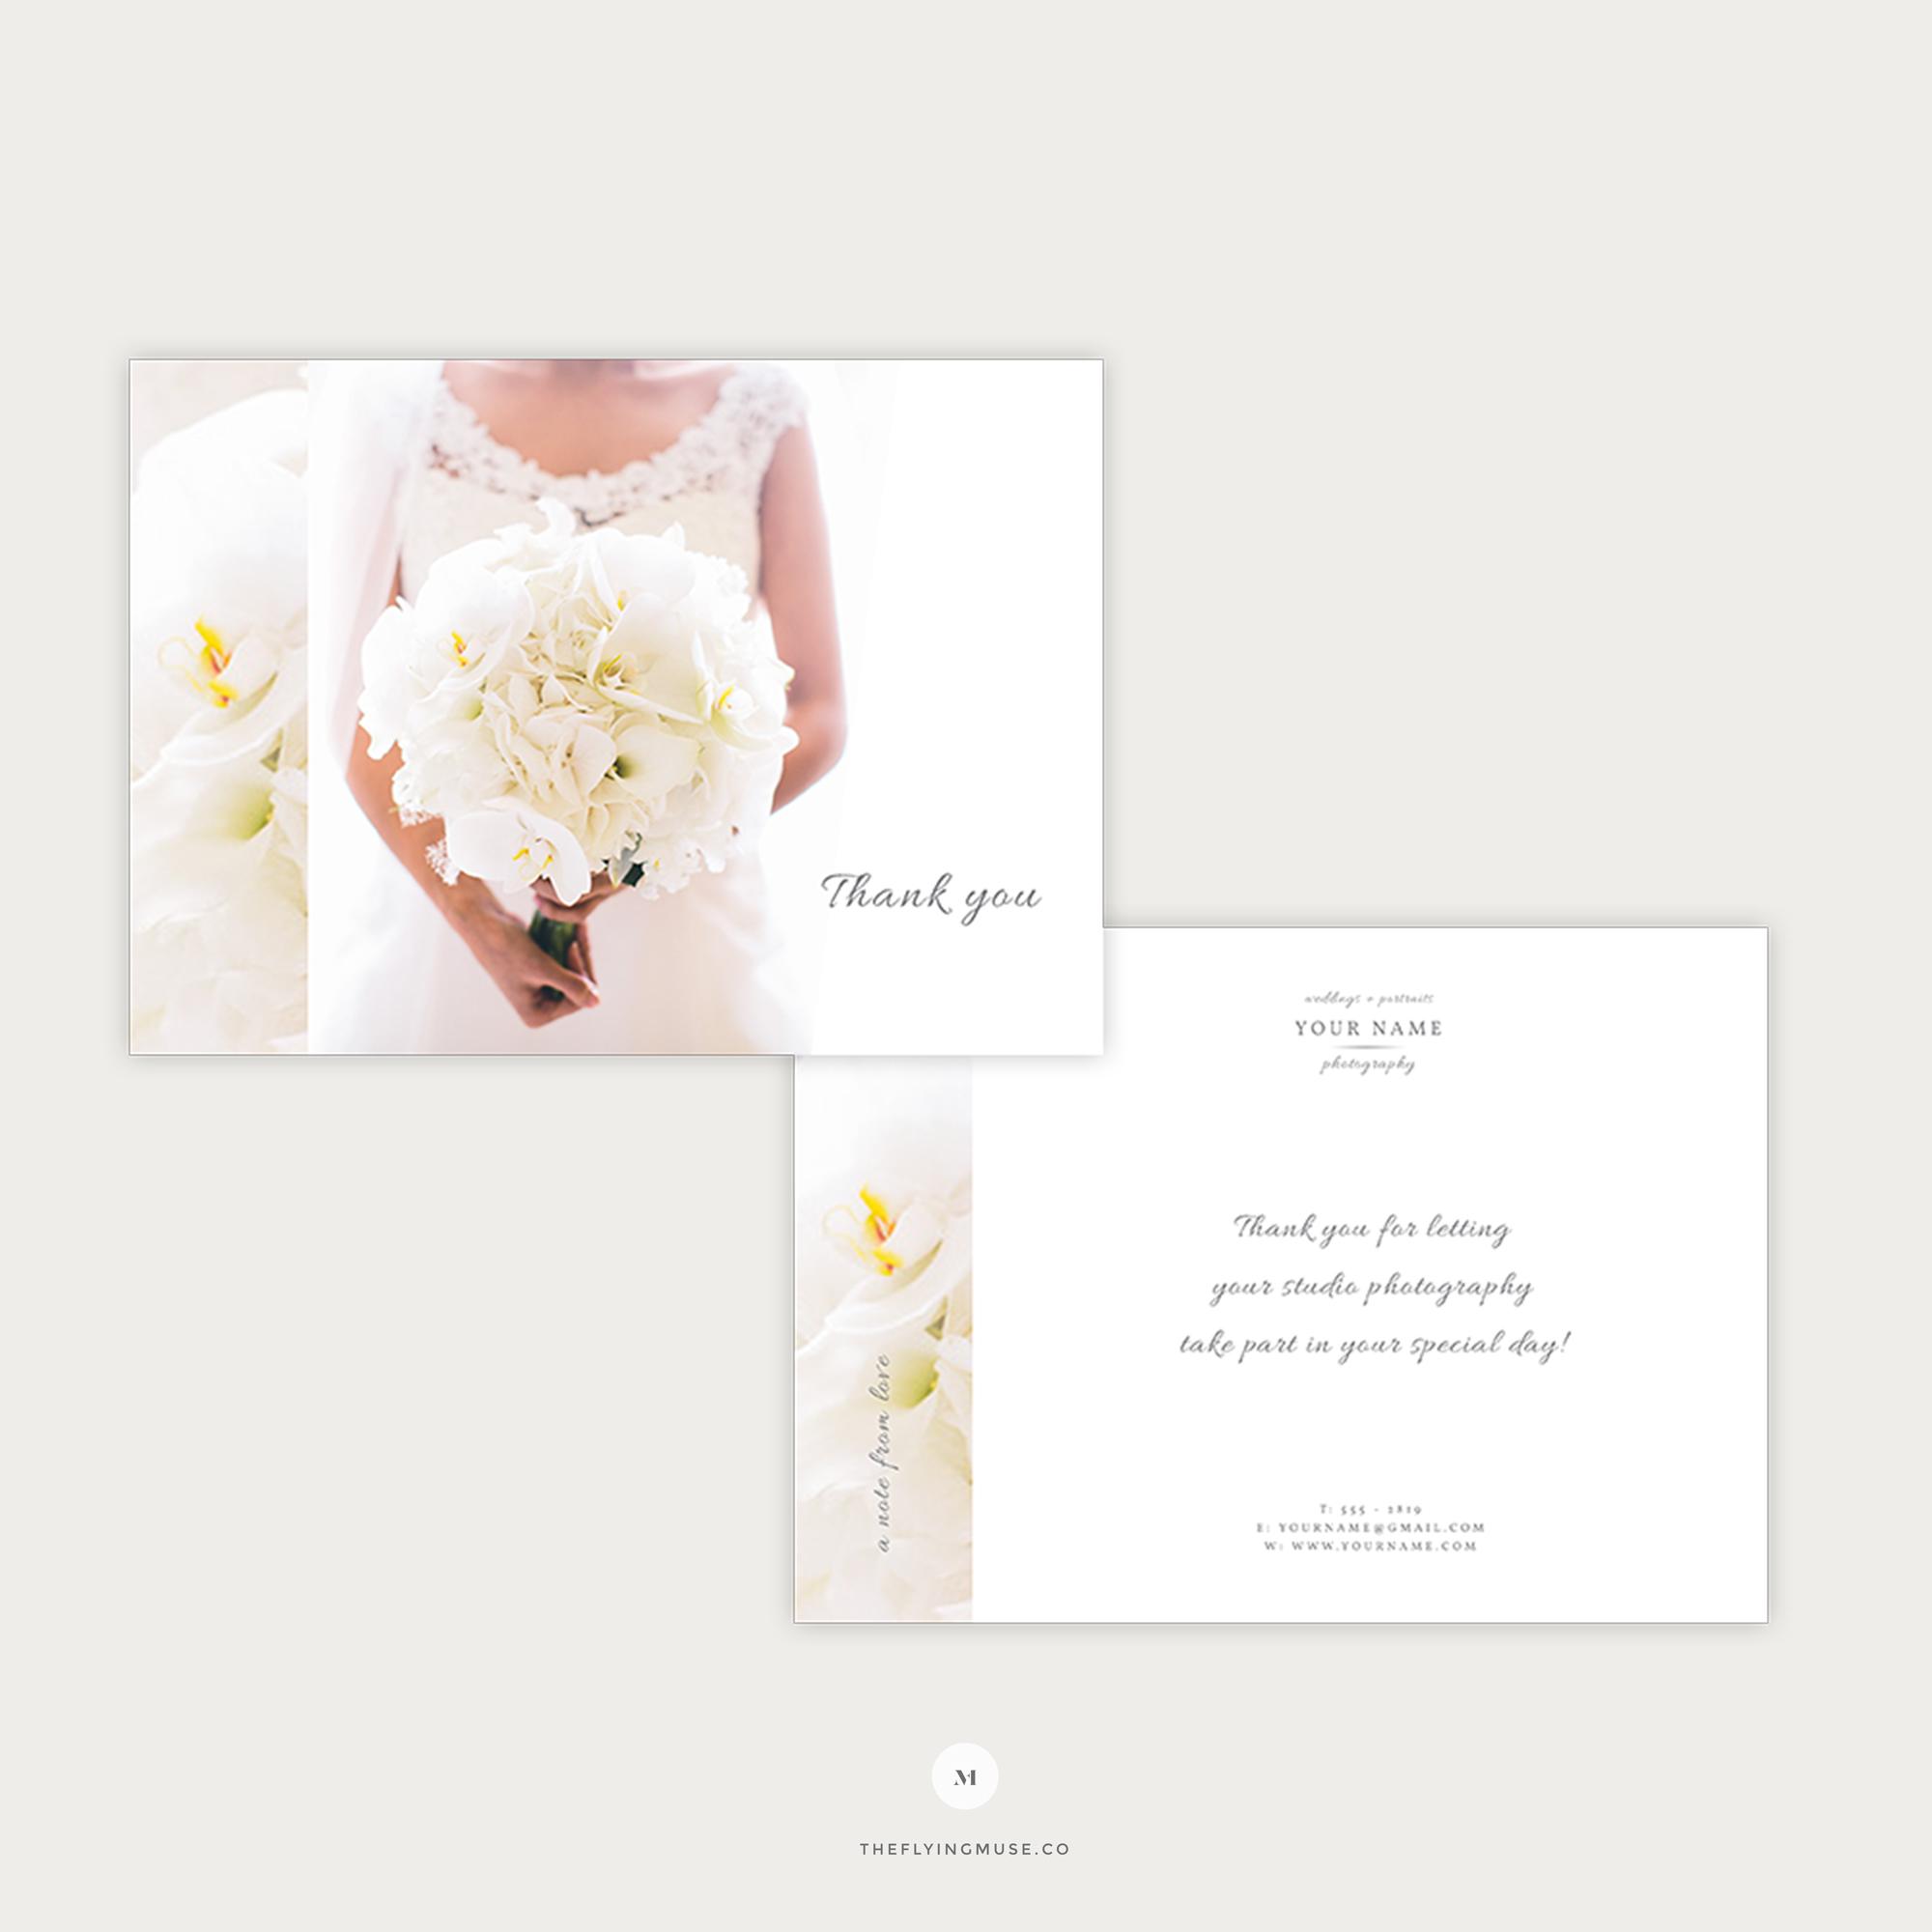 007 Striking Thank You Card Template Wedding Example  Free Printable PublisherFull